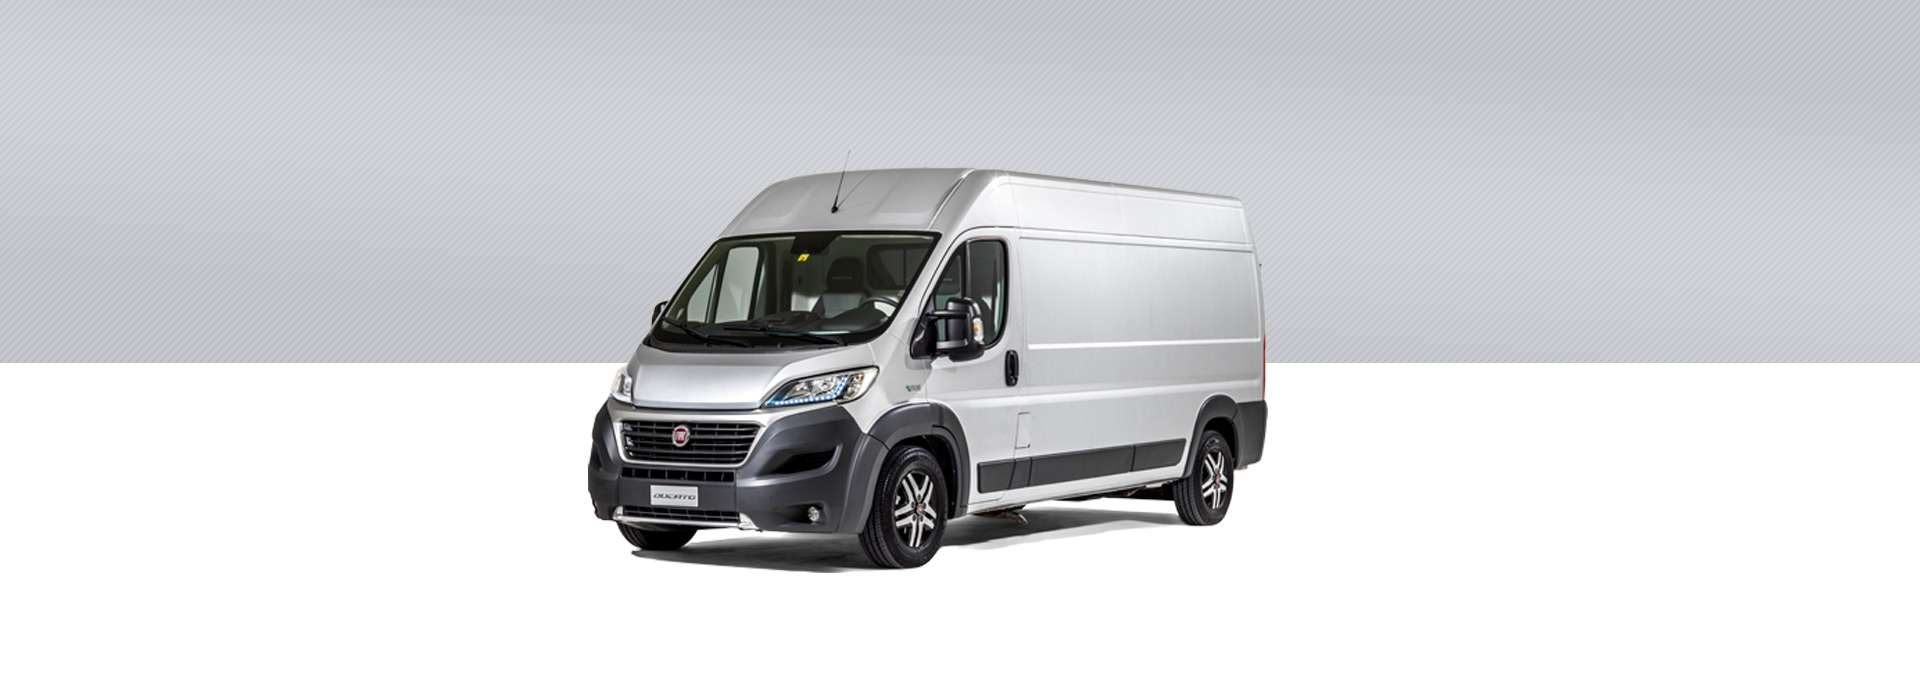 Fiat Ducato Transporte de Mercancías